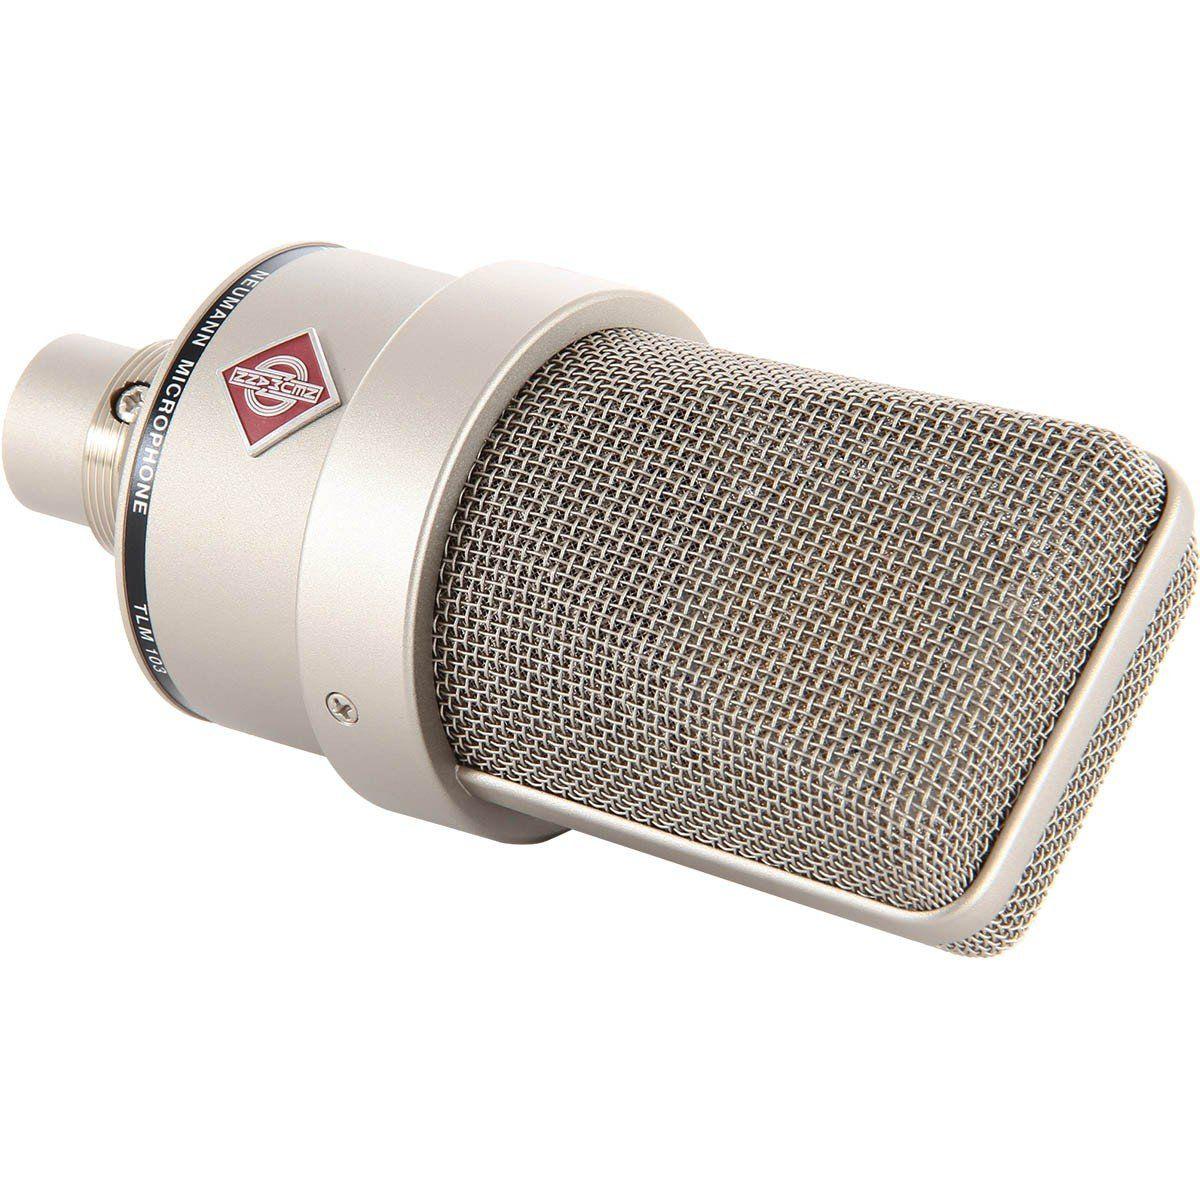 Neumann TLM 103 Microfone Cardioide Condensador Neumann TLM-103 para Estúdio